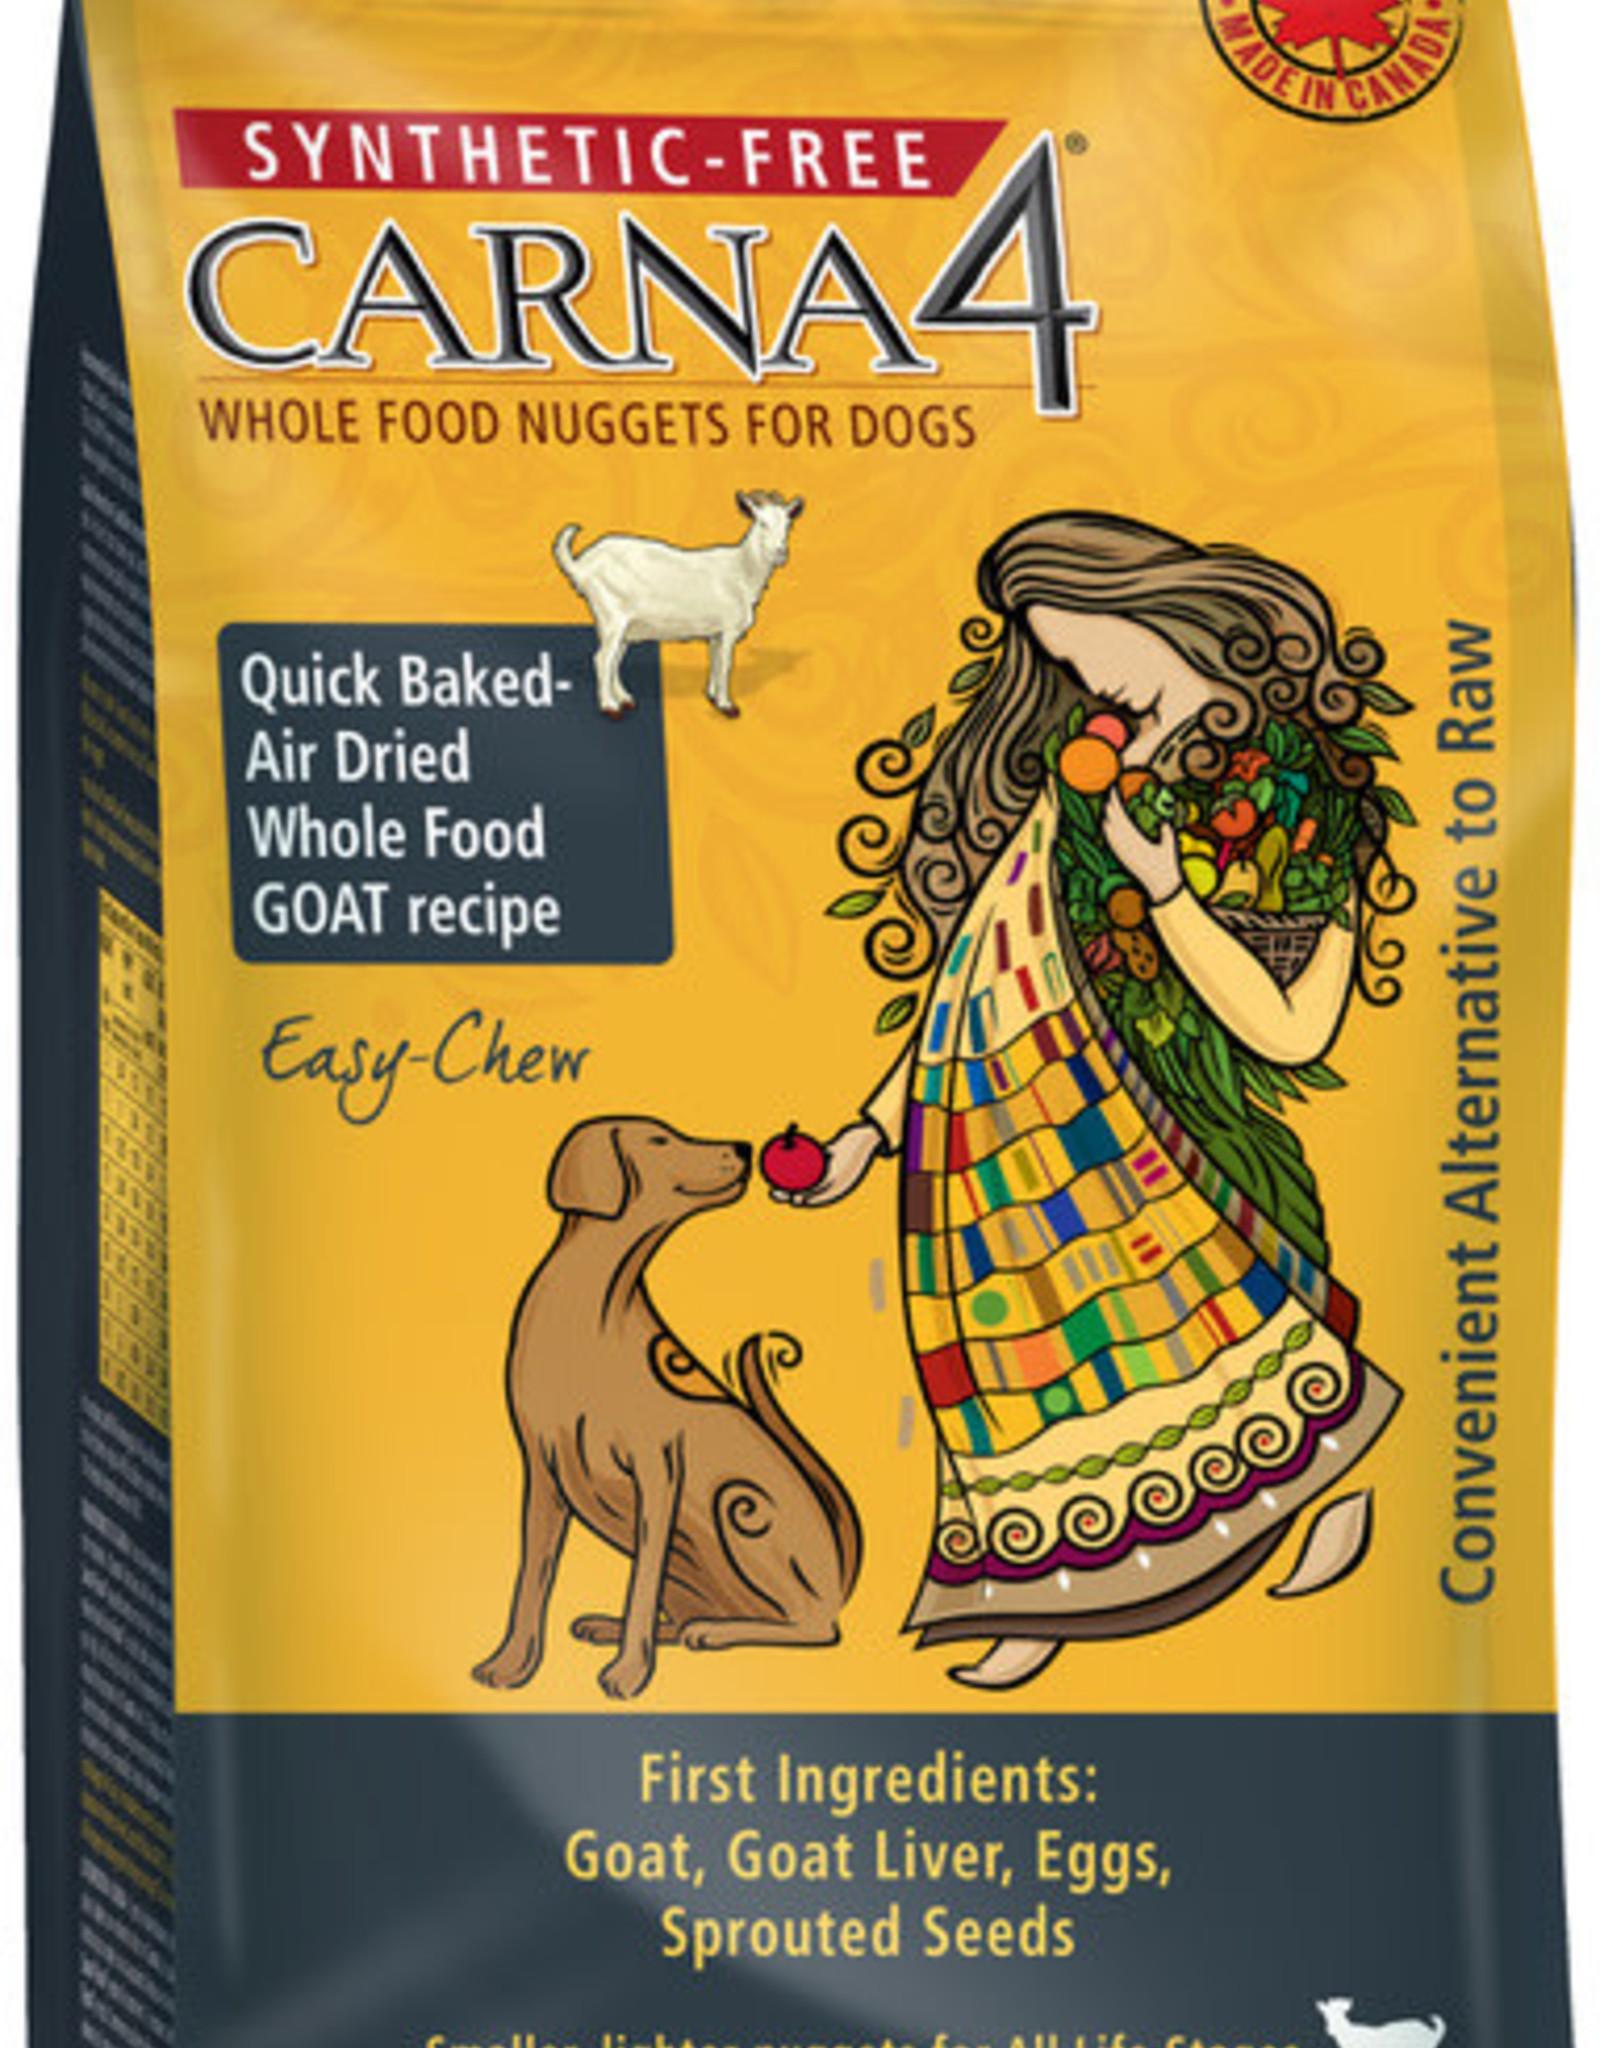 Carna4 Carna4 Oven Baked Easy-Chew Goat